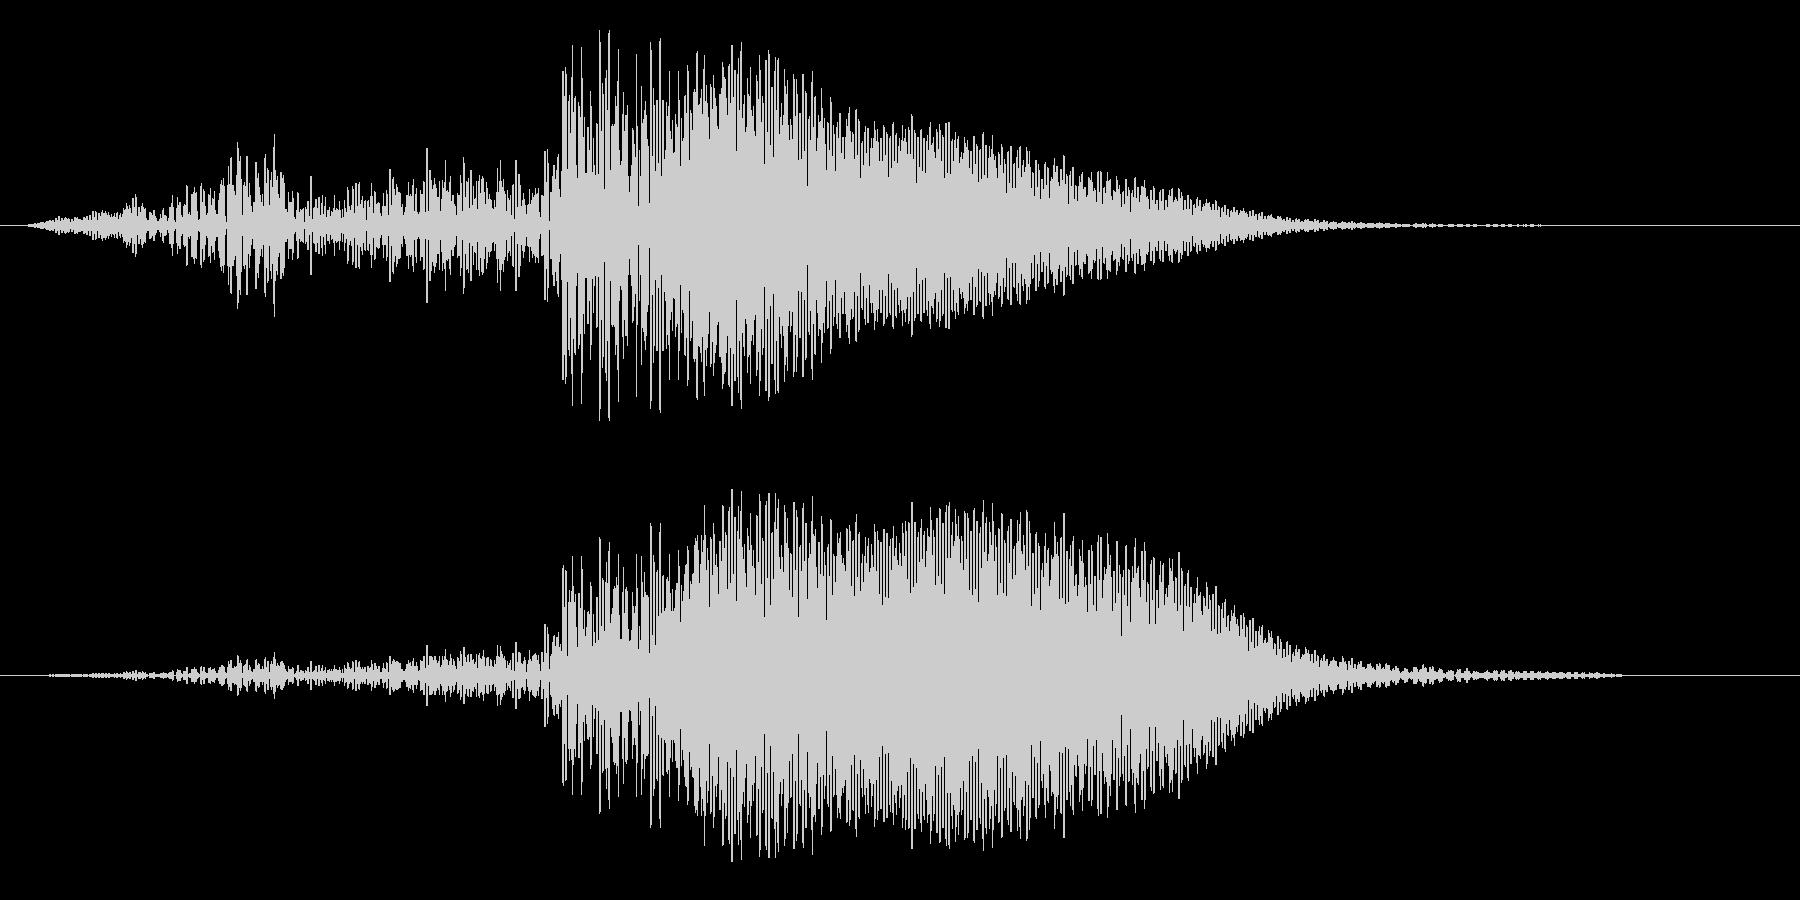 SFや近未来作品に適したほわんとした音の未再生の波形